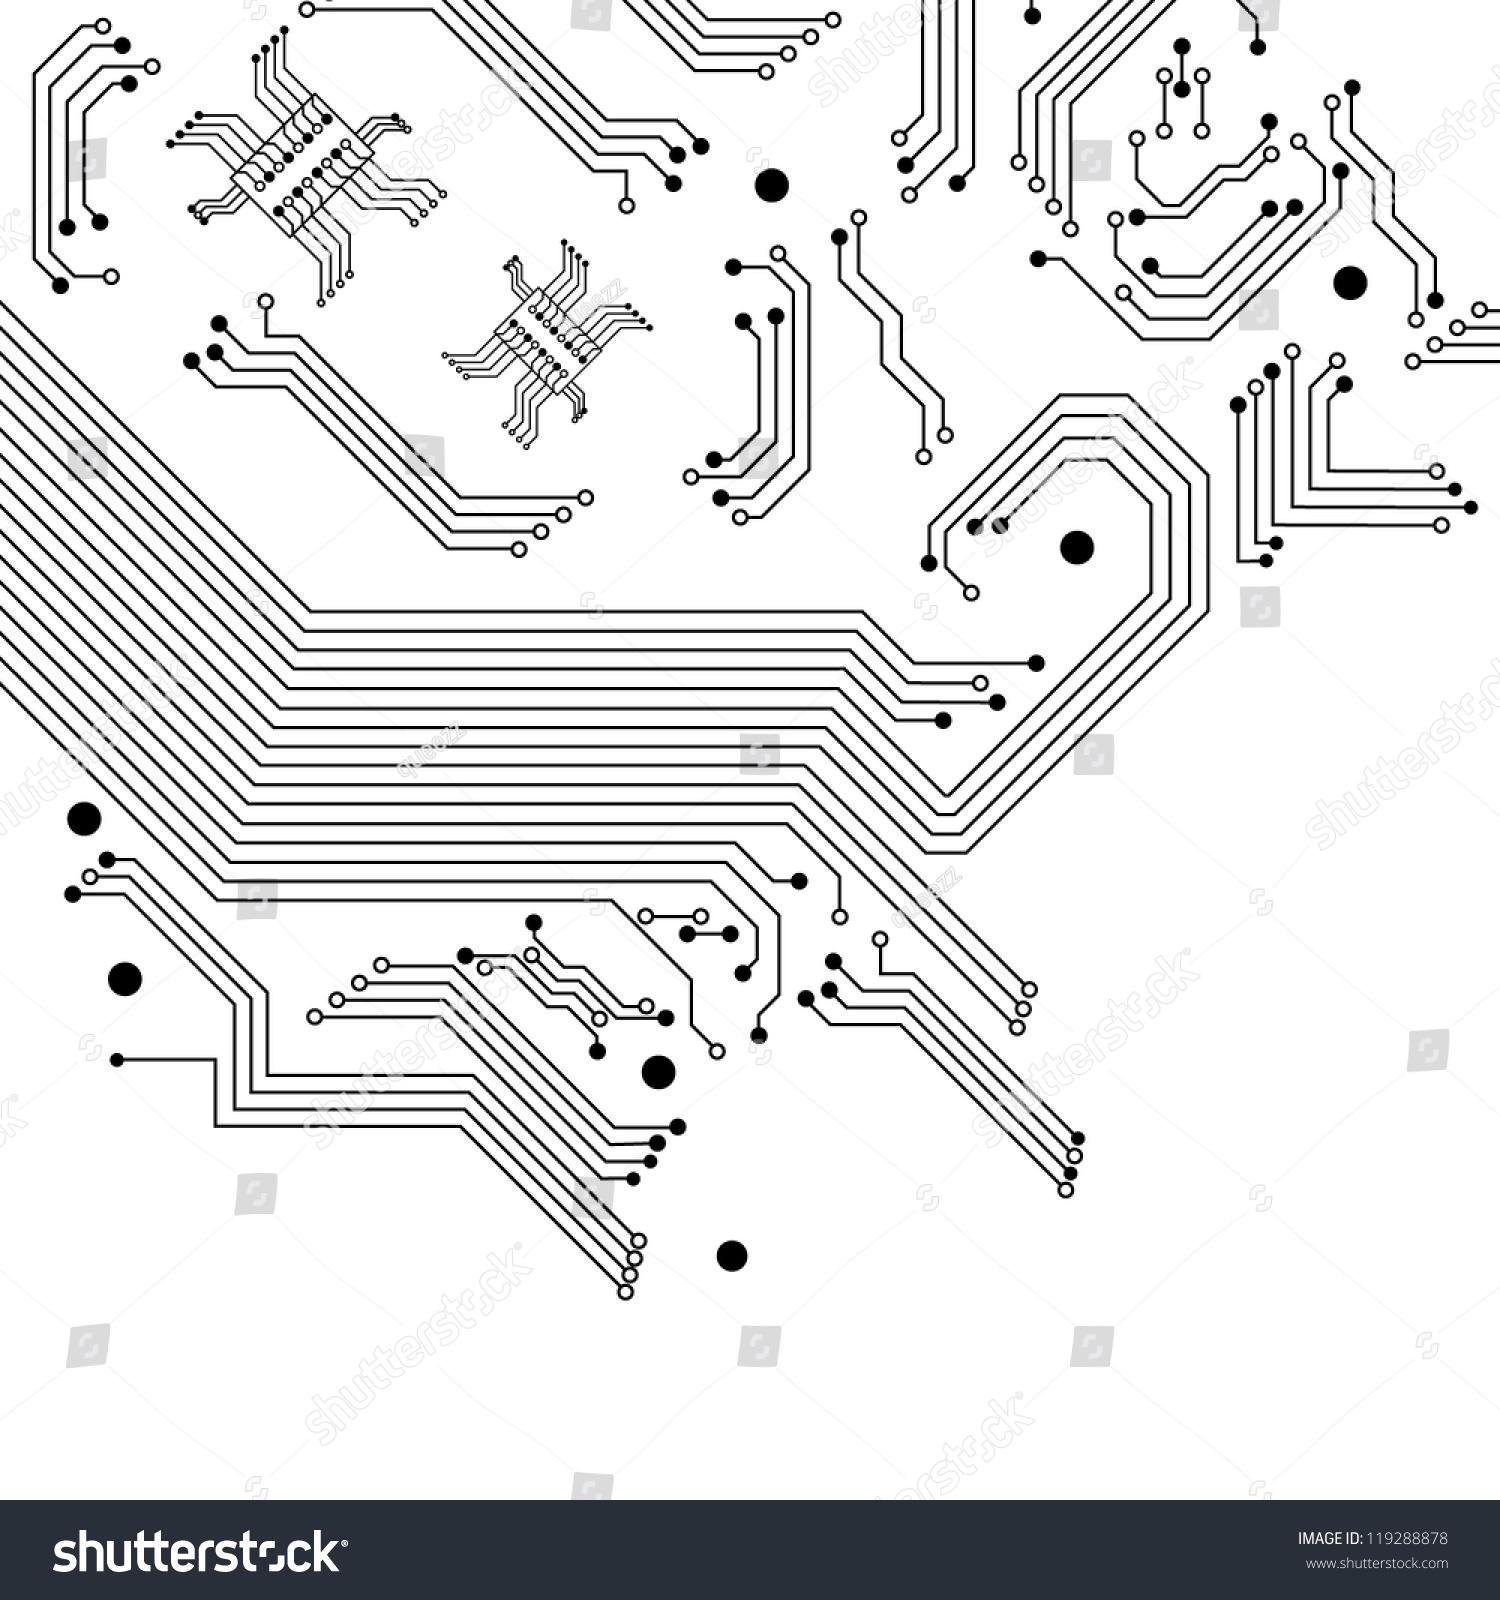 Digital Background Electric Circuit Vector Illustration Stock Vector ...